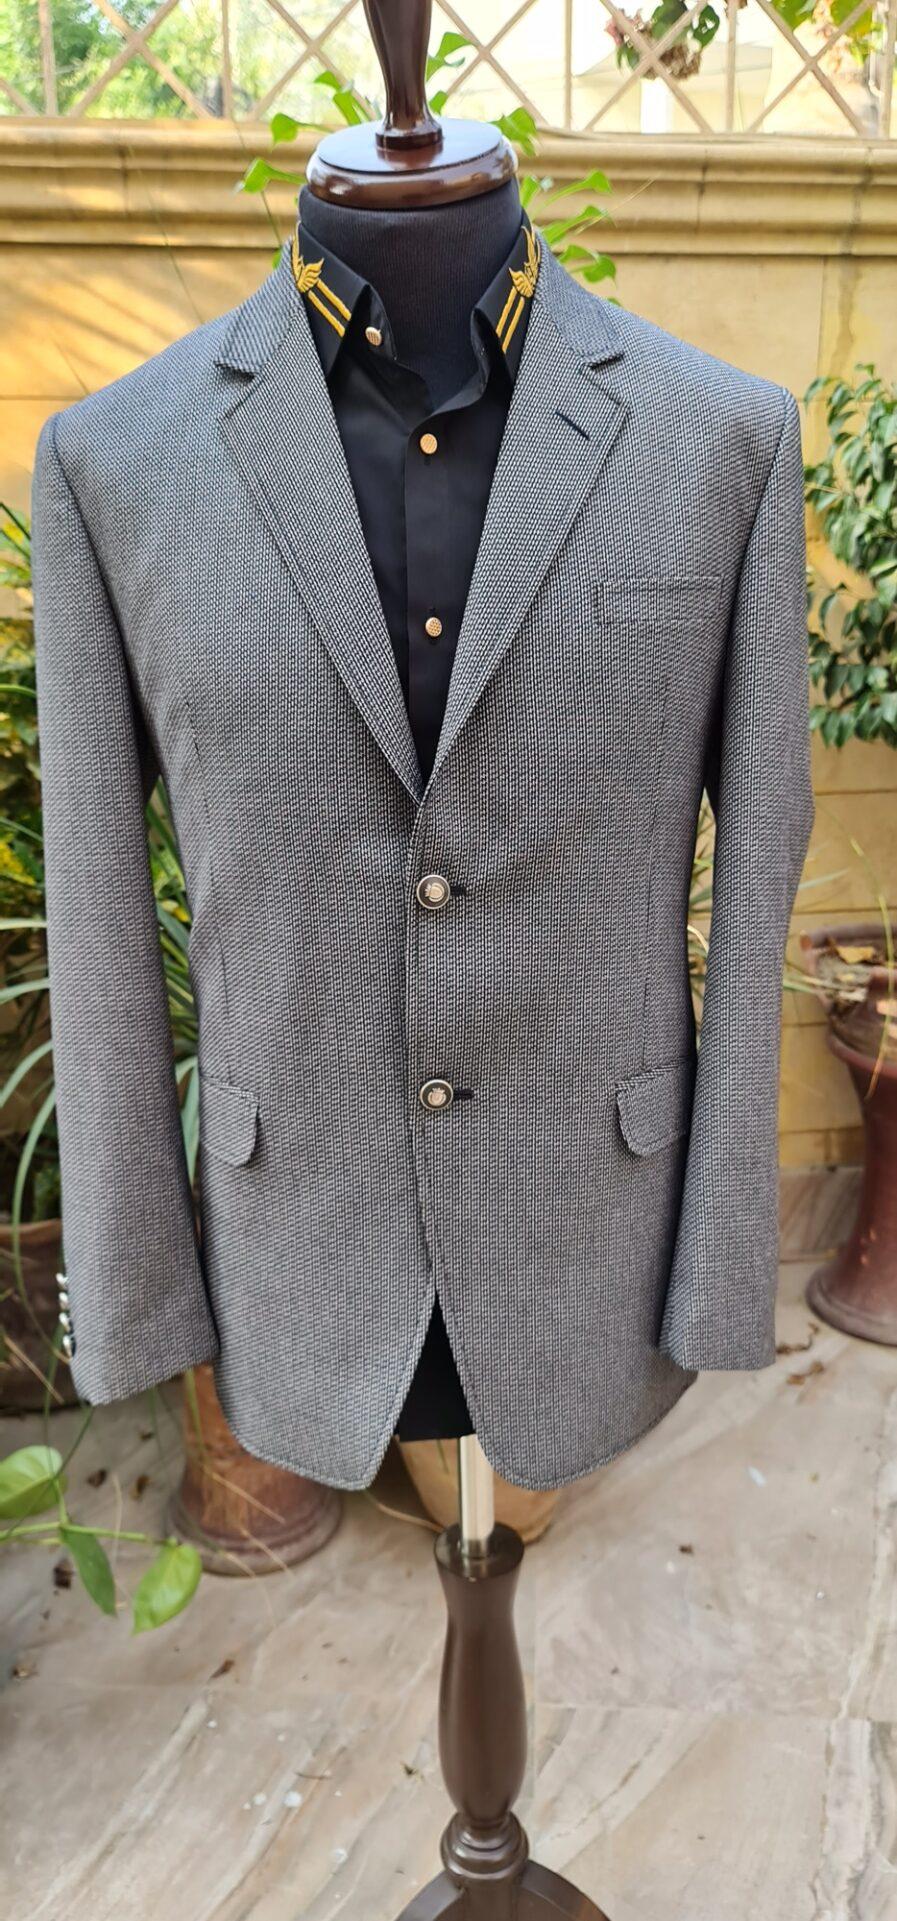 Grey & Black Textured Tweed Blazer